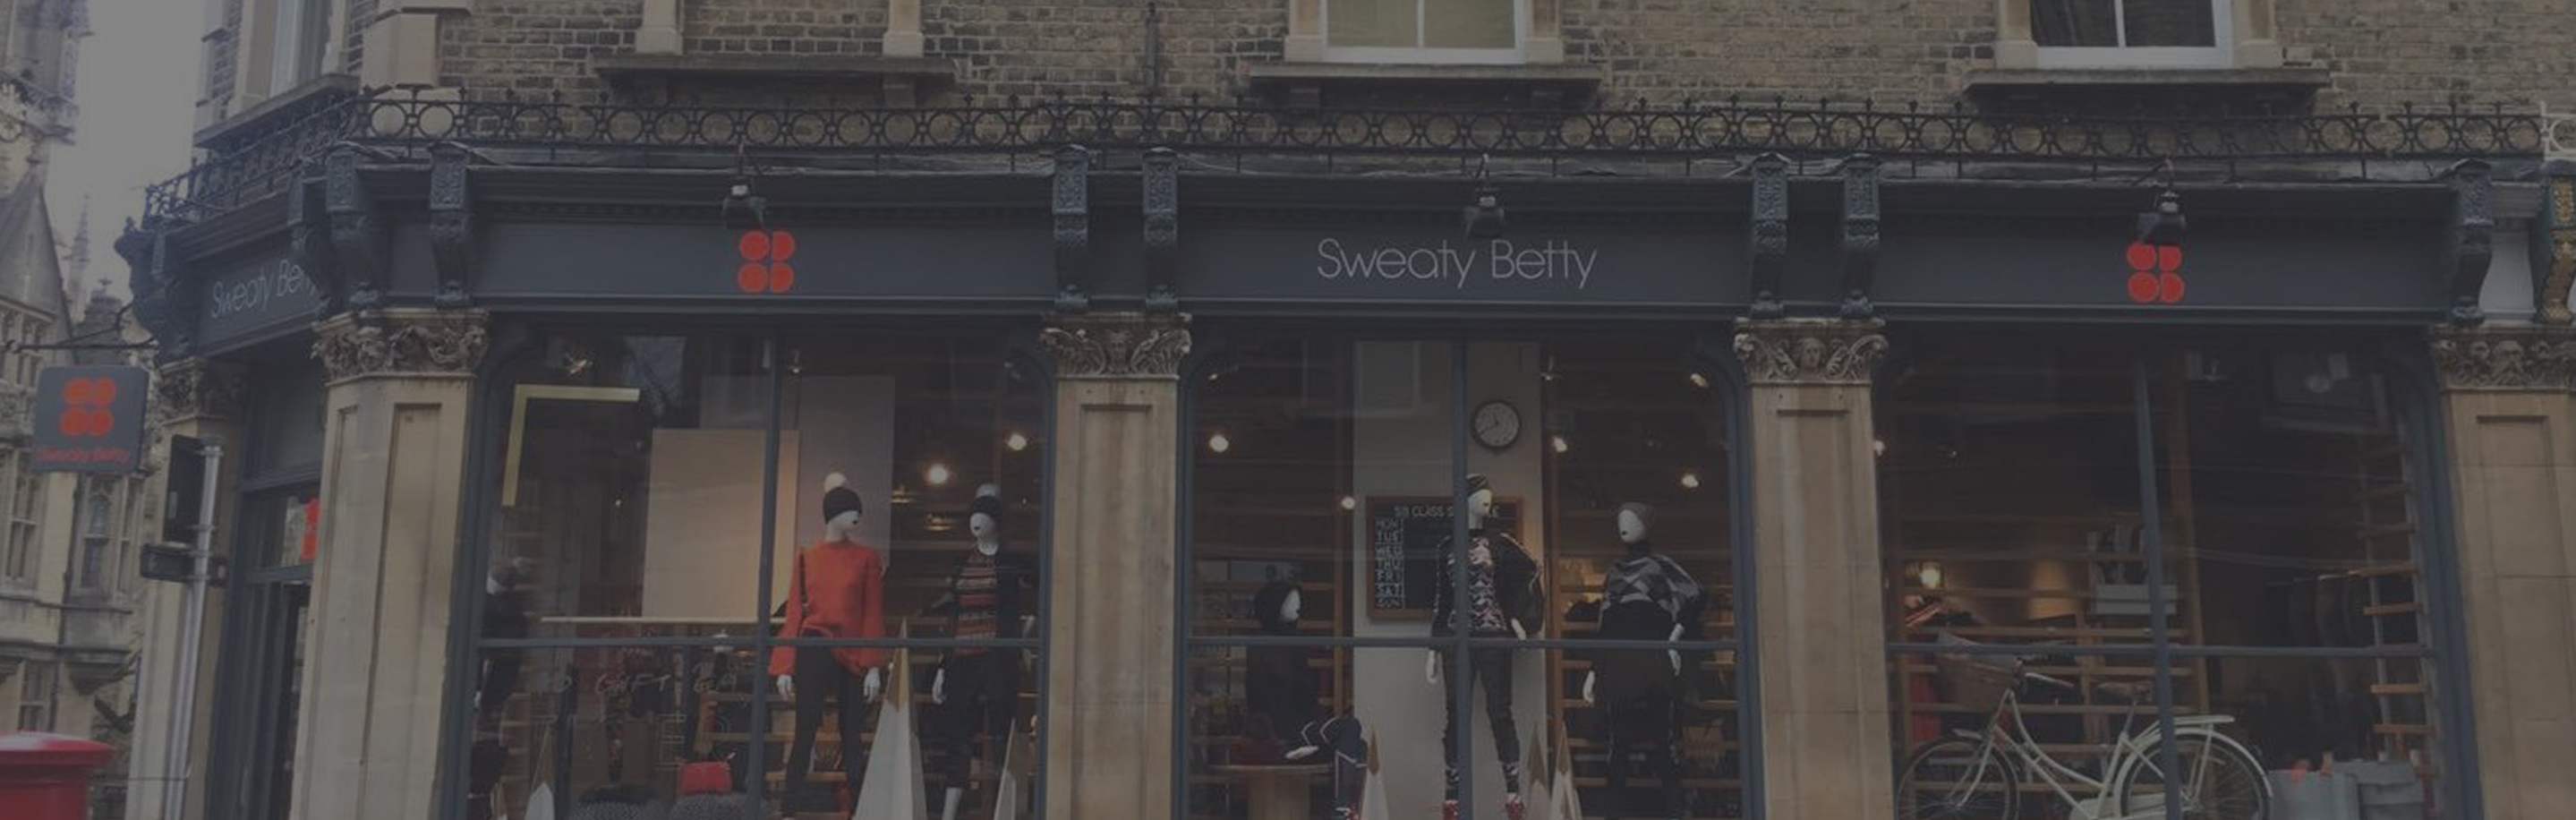 Sweaty Betty Oxford